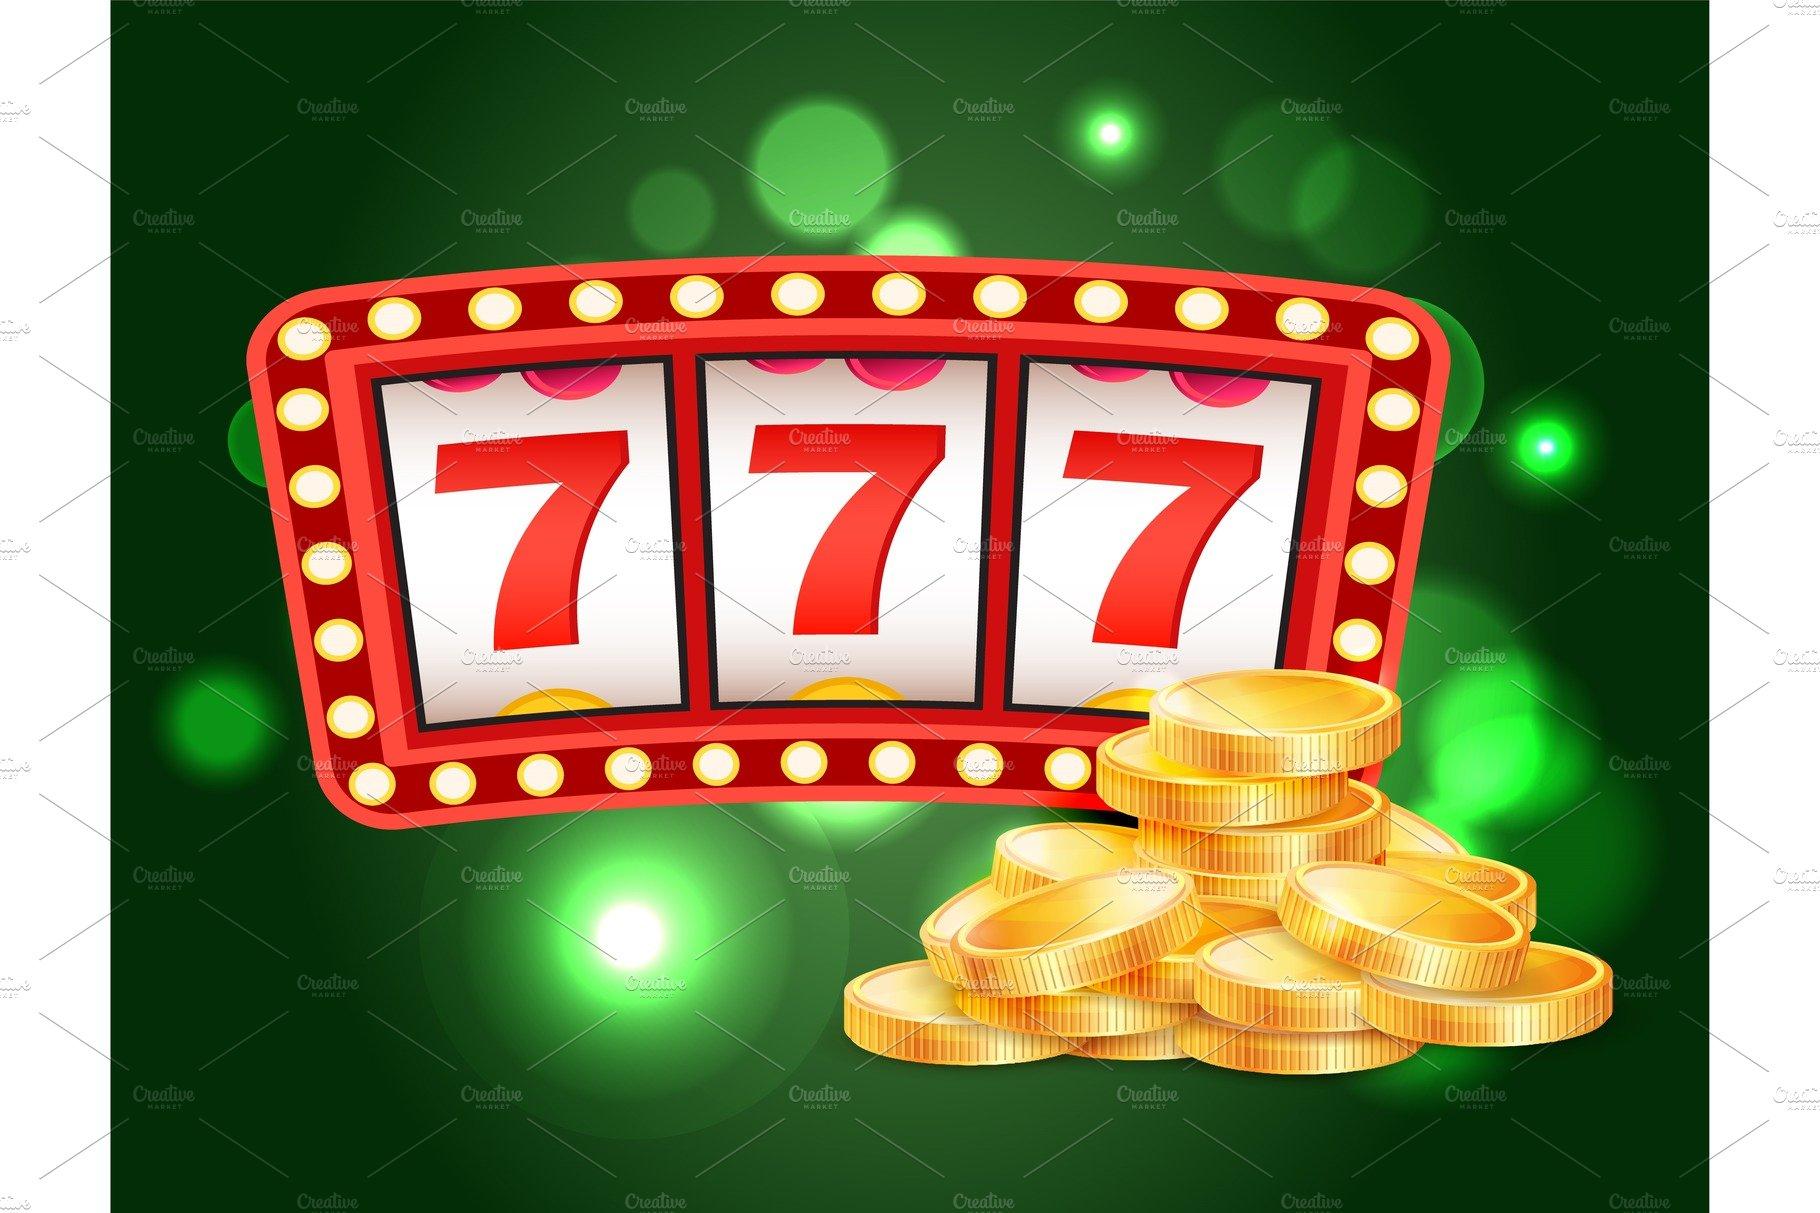 Echt online casino skripte